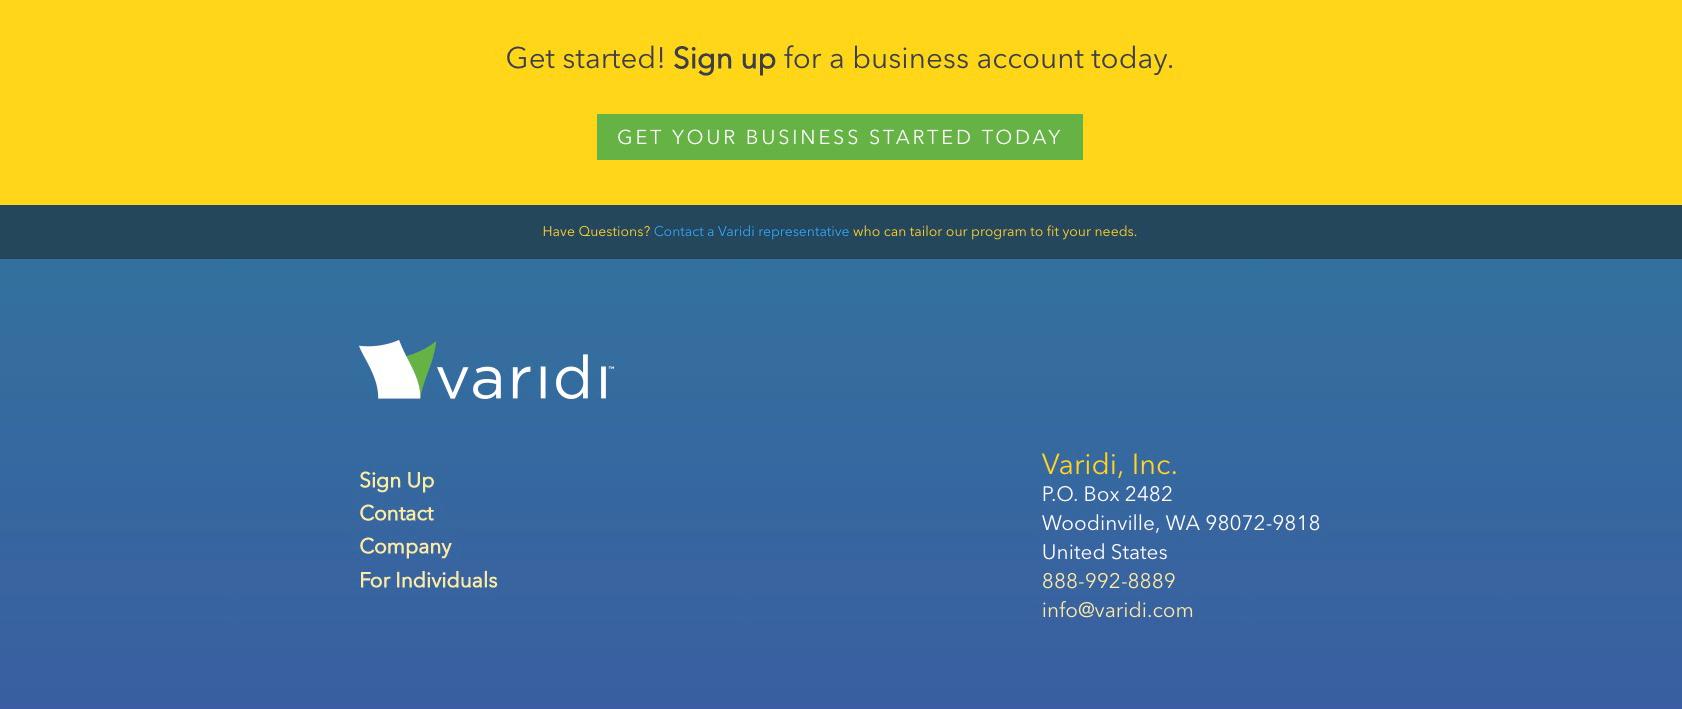 Varidi Website Design